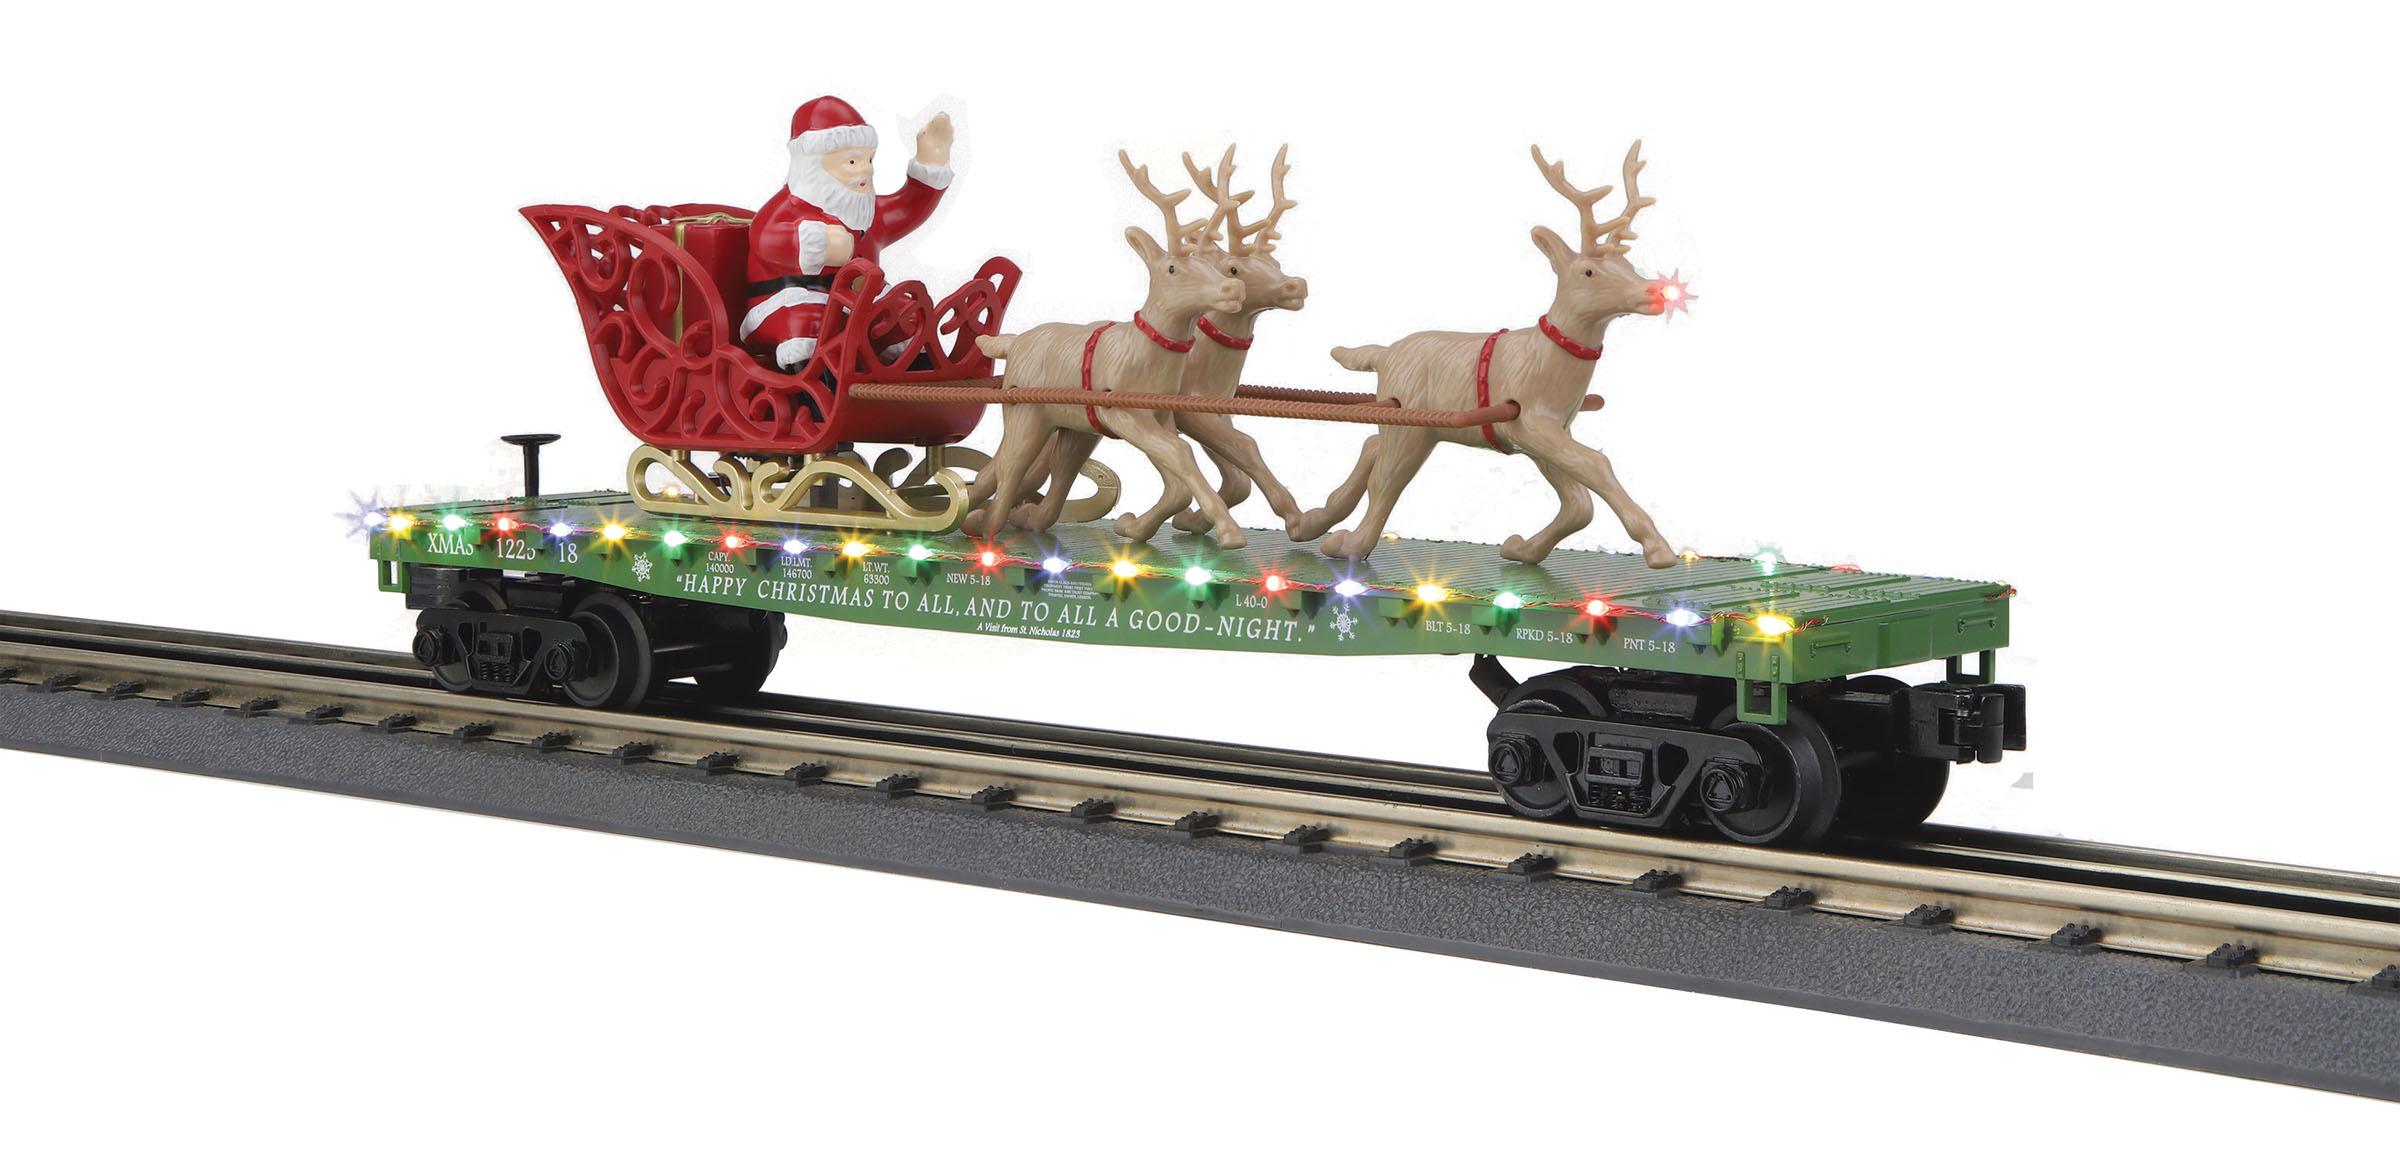 MTH 30-76741 Flatcar with LED Lights Santa and Reindeer 3 Rail RailKi Christmas